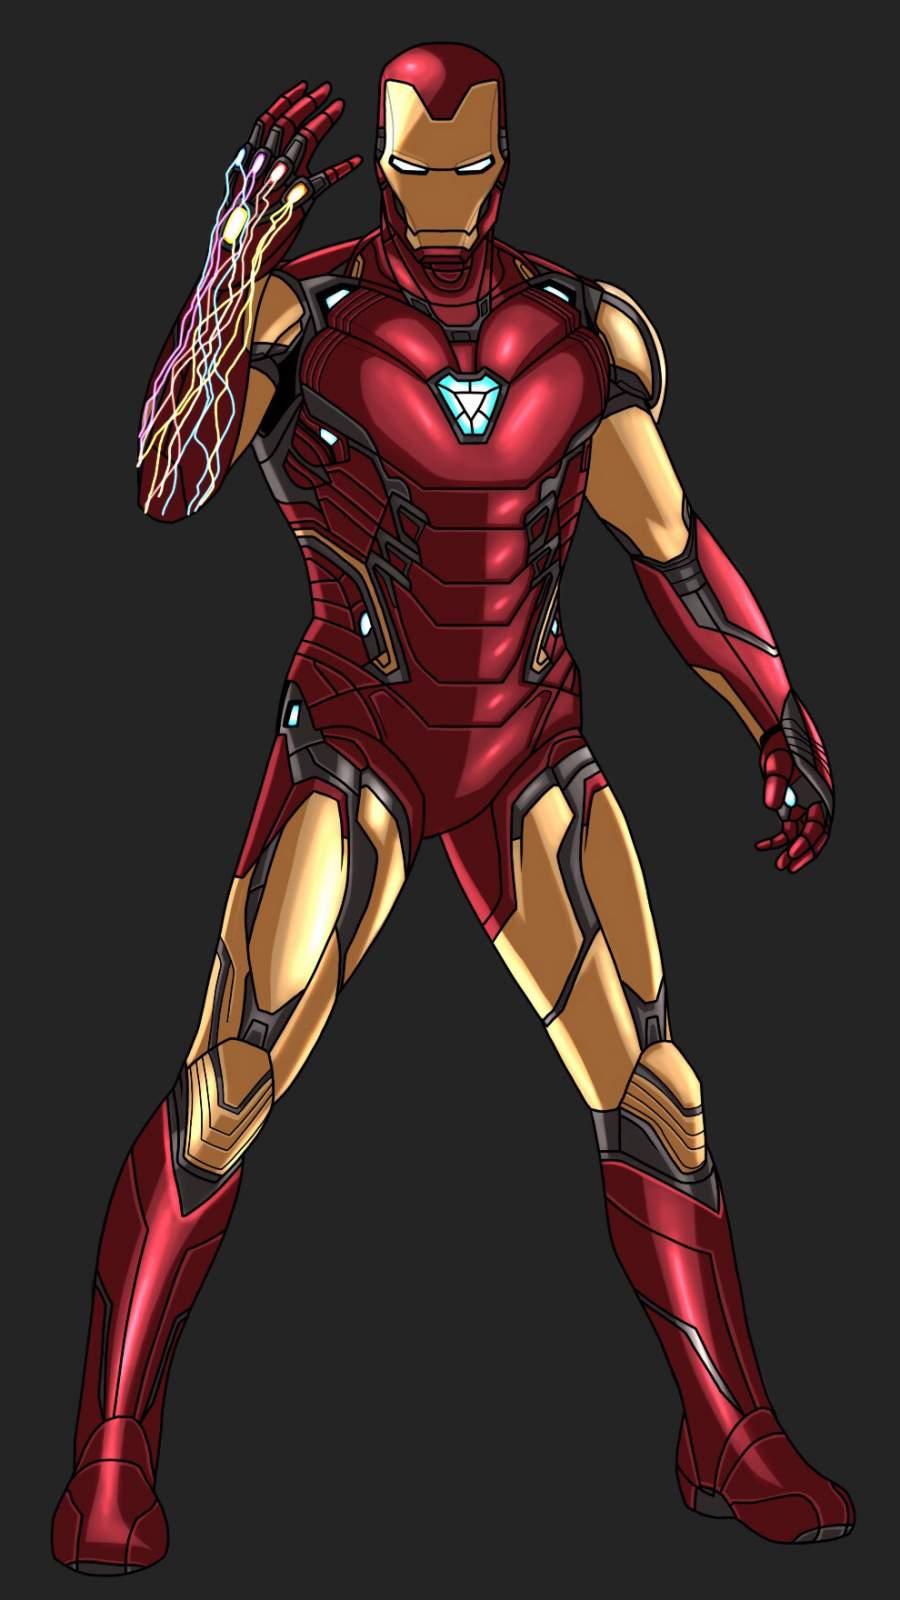 I am Iron Man Snap Animated Art iPhone Wallpaper